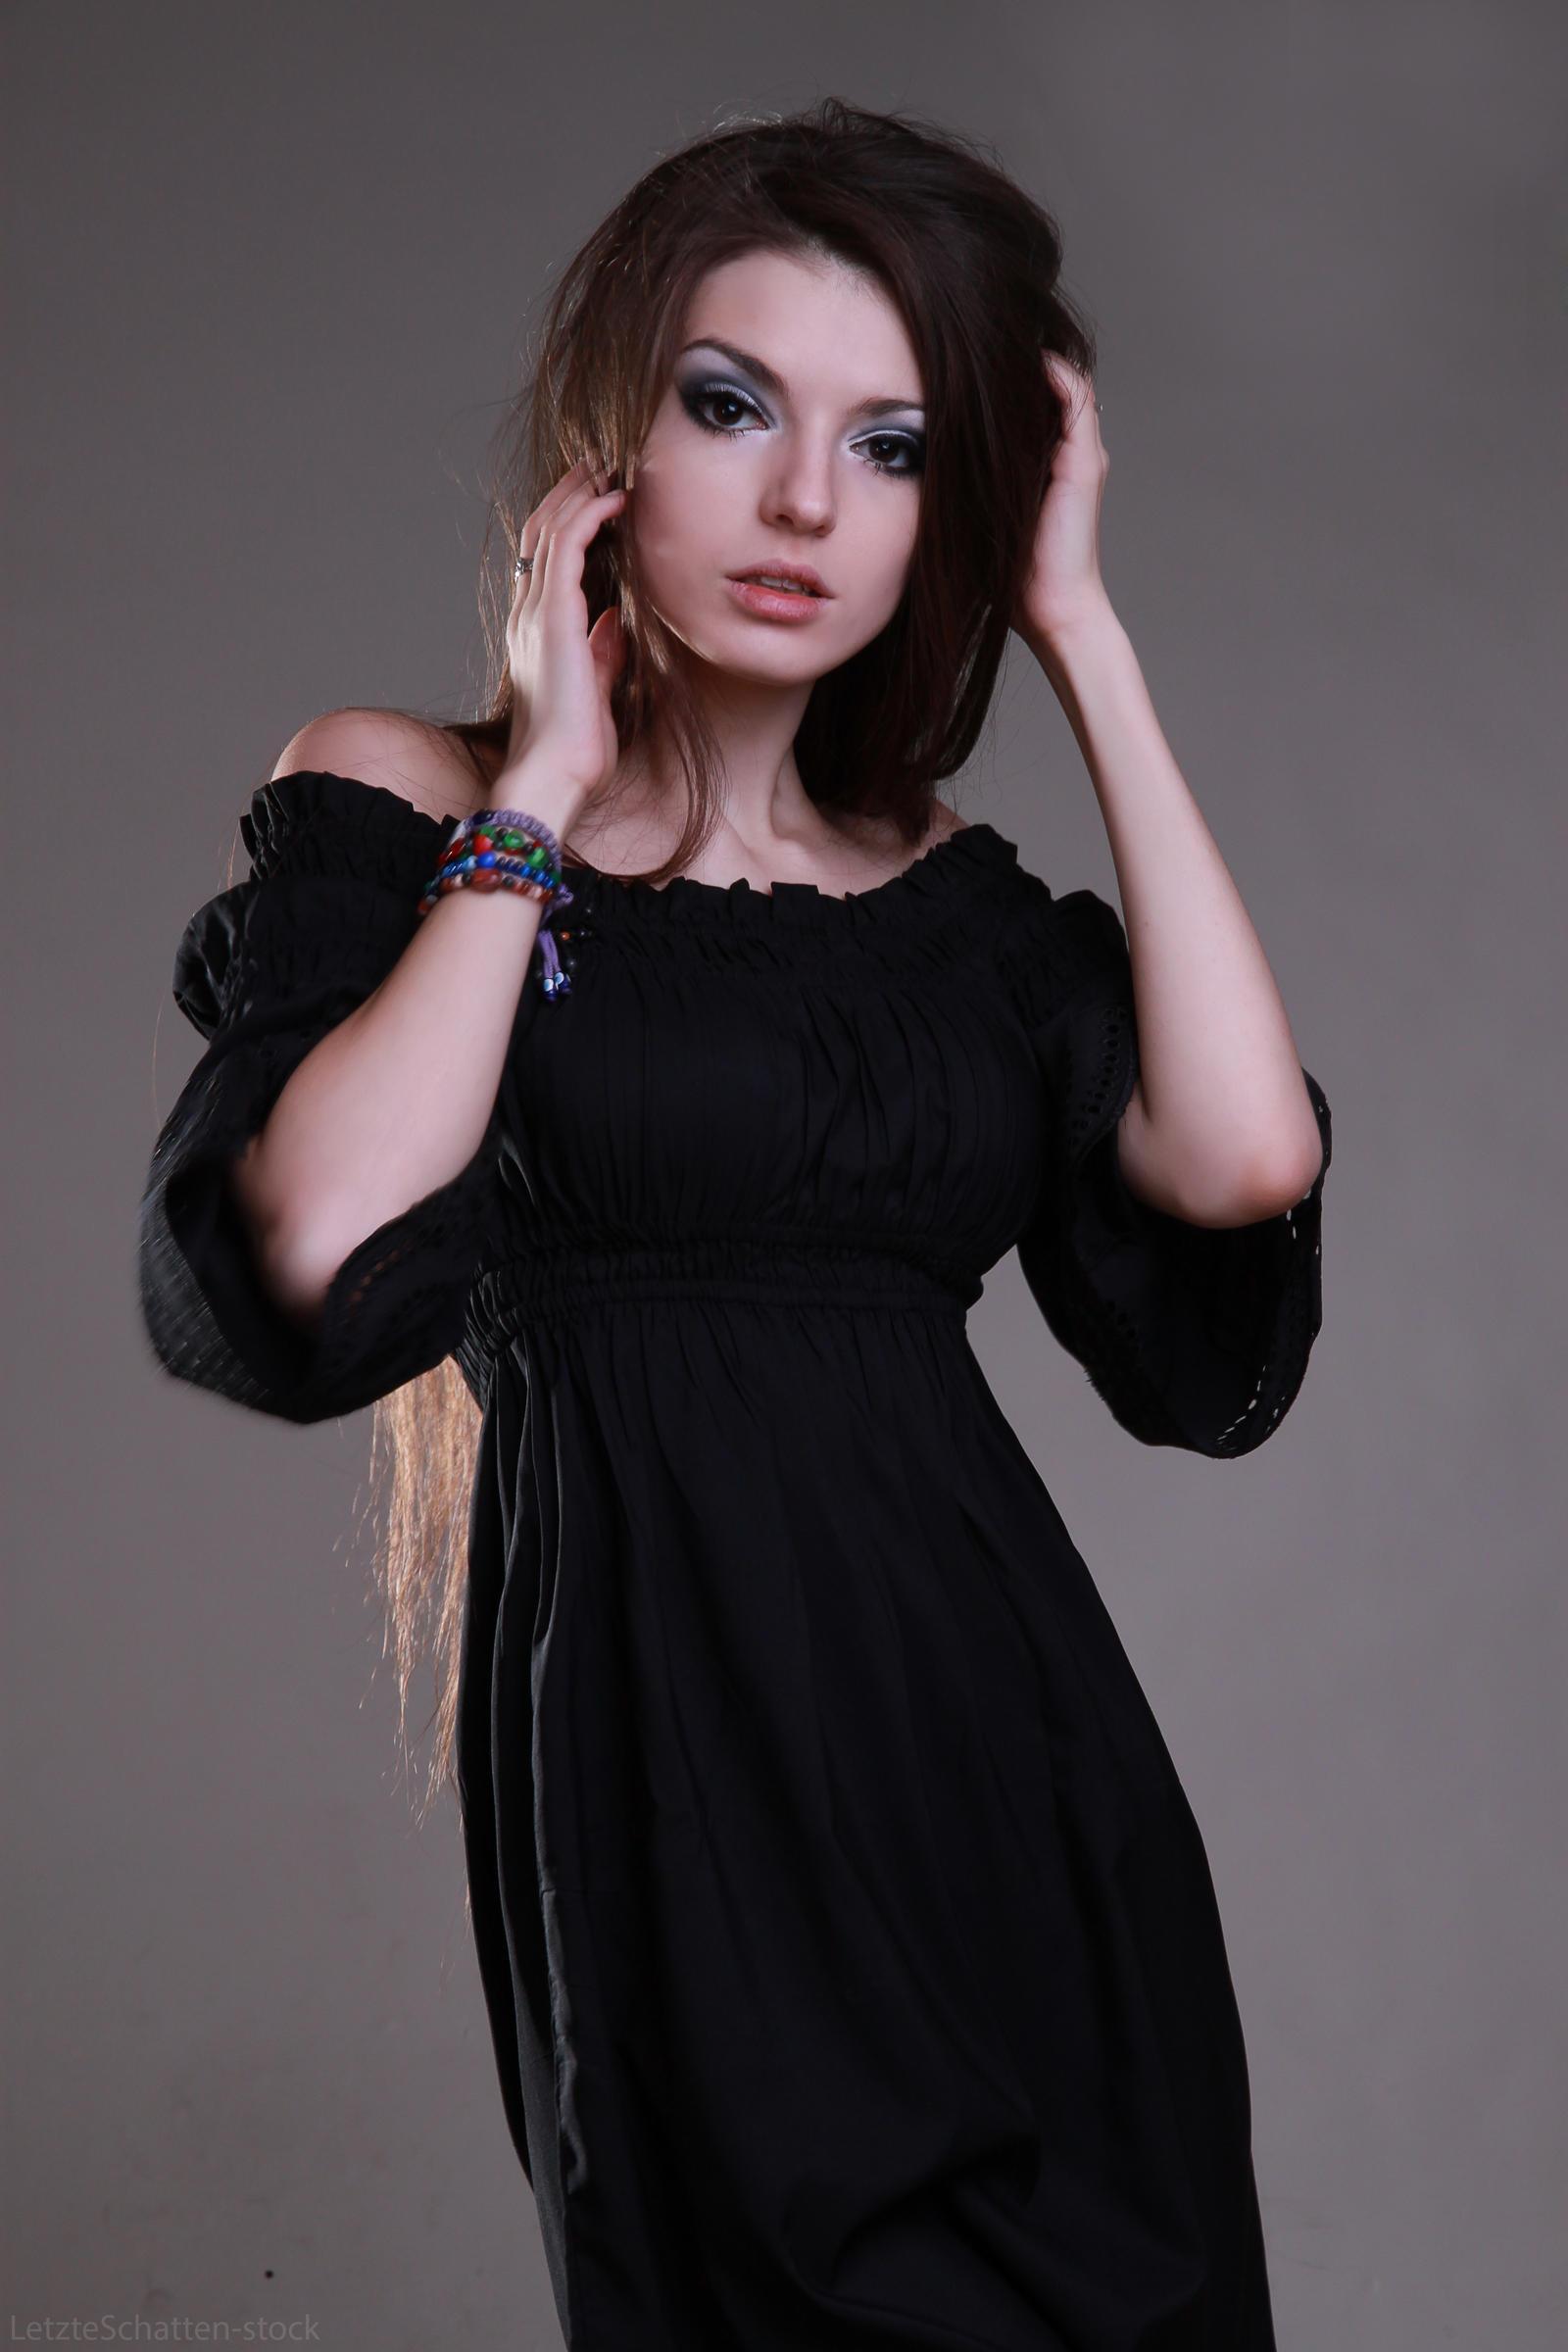 Back In Black 1 By LetzteSchatten-stock On DeviantArt